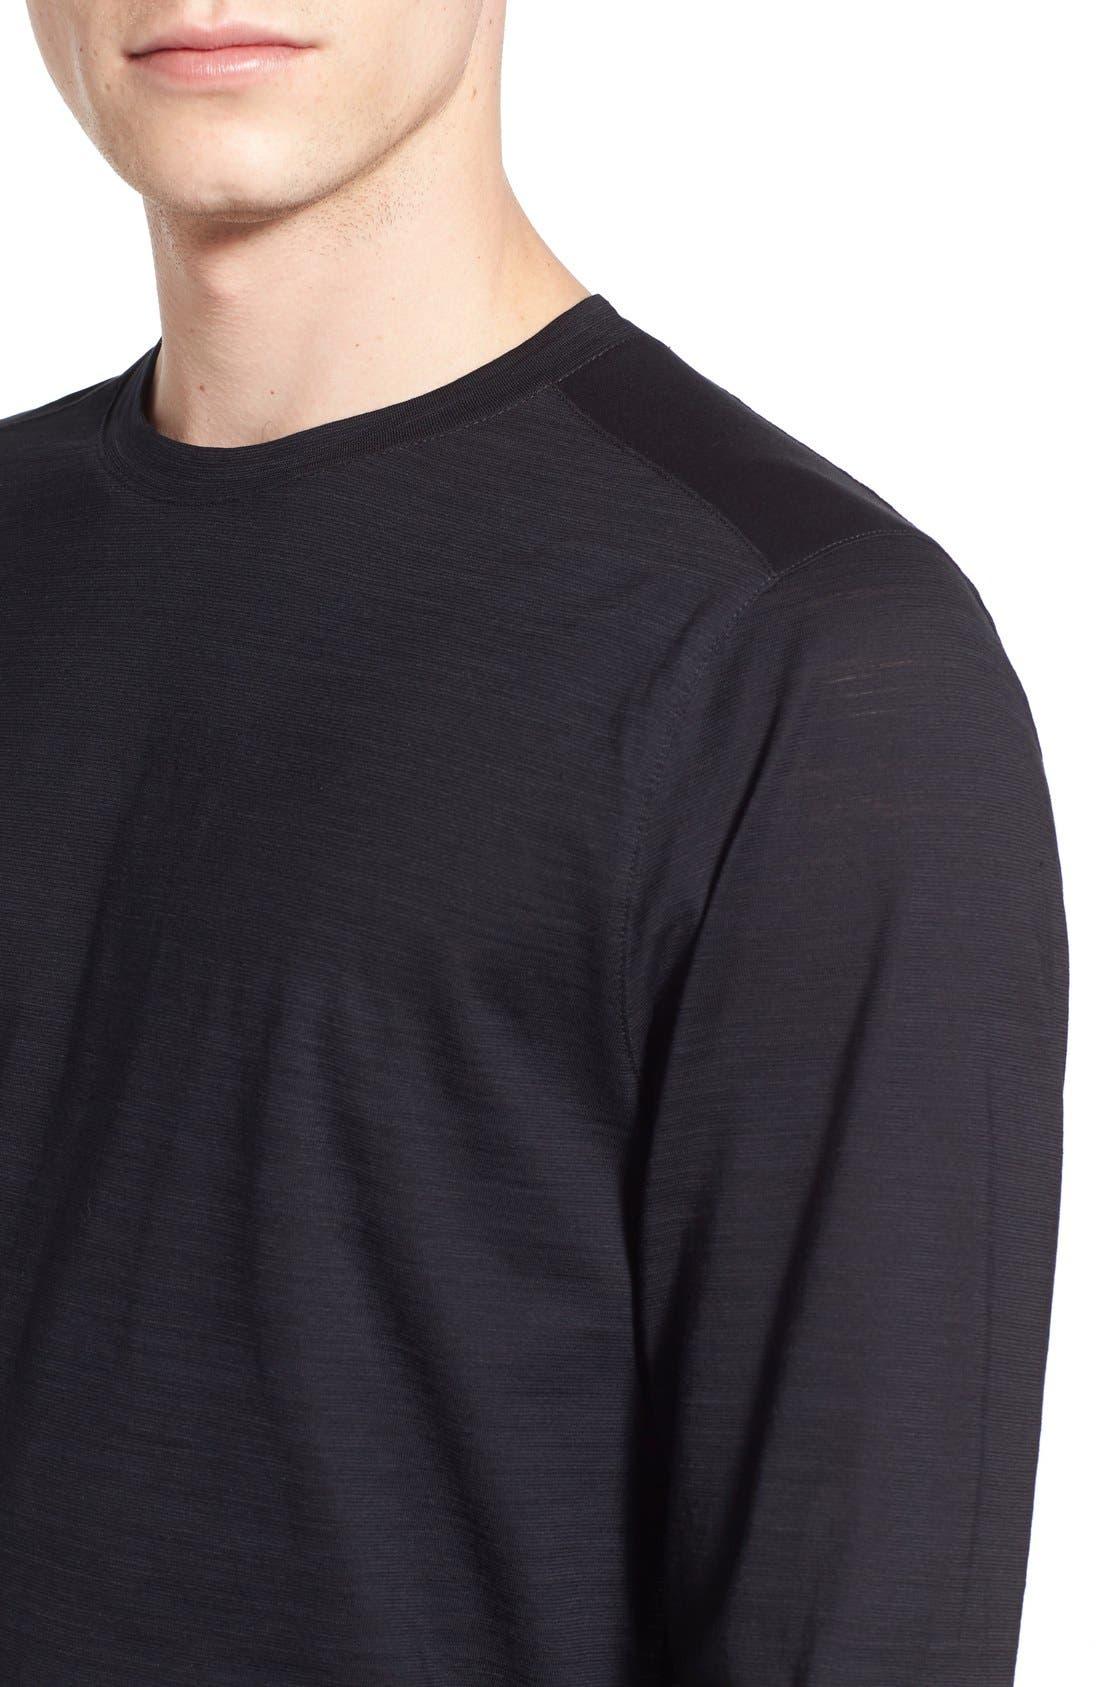 'Tenison' Slim Fit Long Sleeve T-Shirt,                             Alternate thumbnail 4, color,                             001